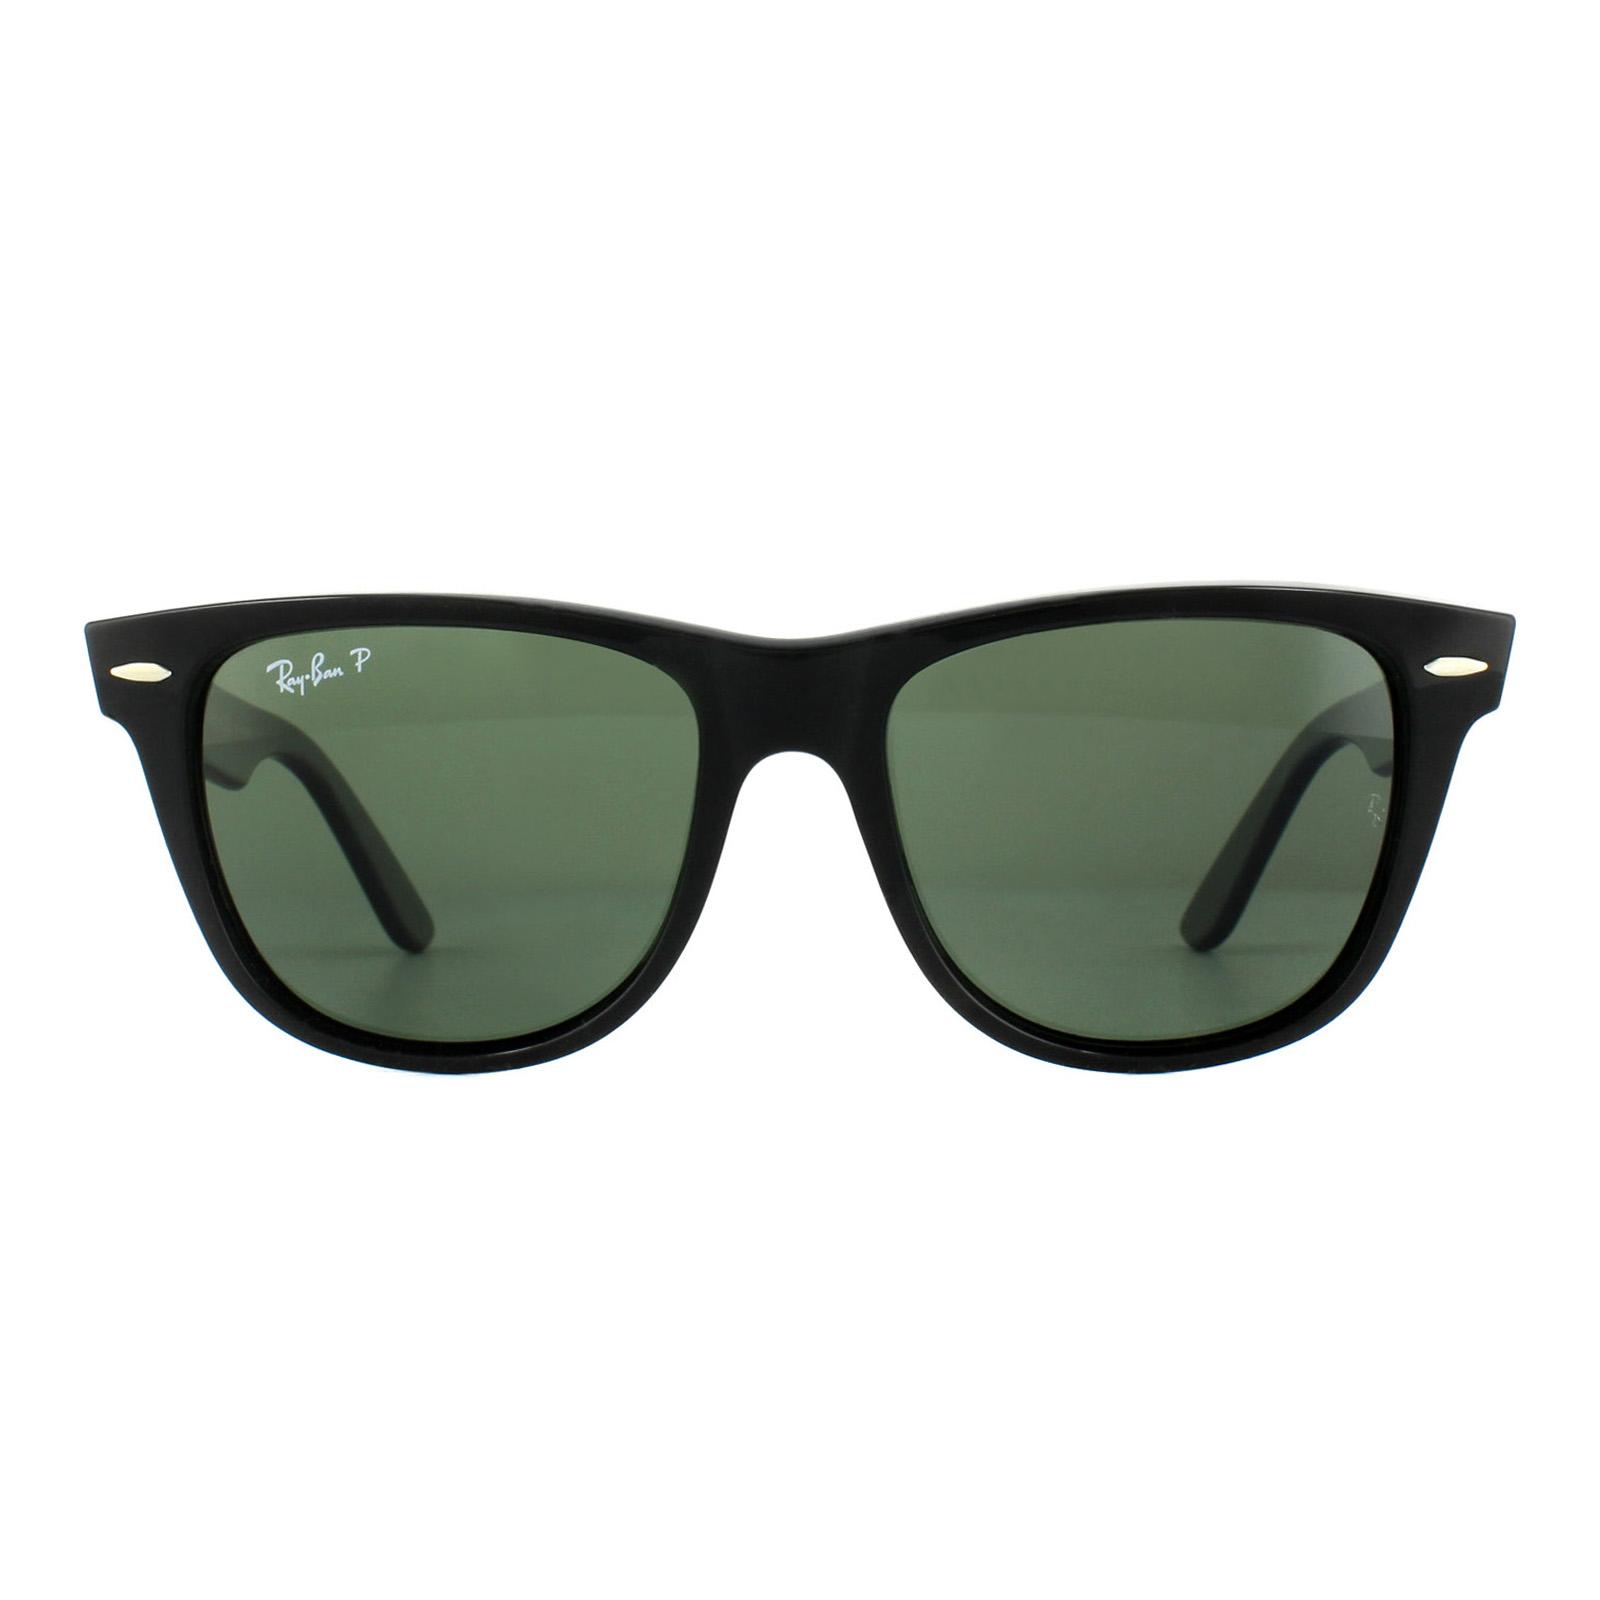 Sentinel Ray-Ban Sunglasses Wayfarer 2140 901 58 Black Green G-15 Polarized  Medium f3e2ab9c1a